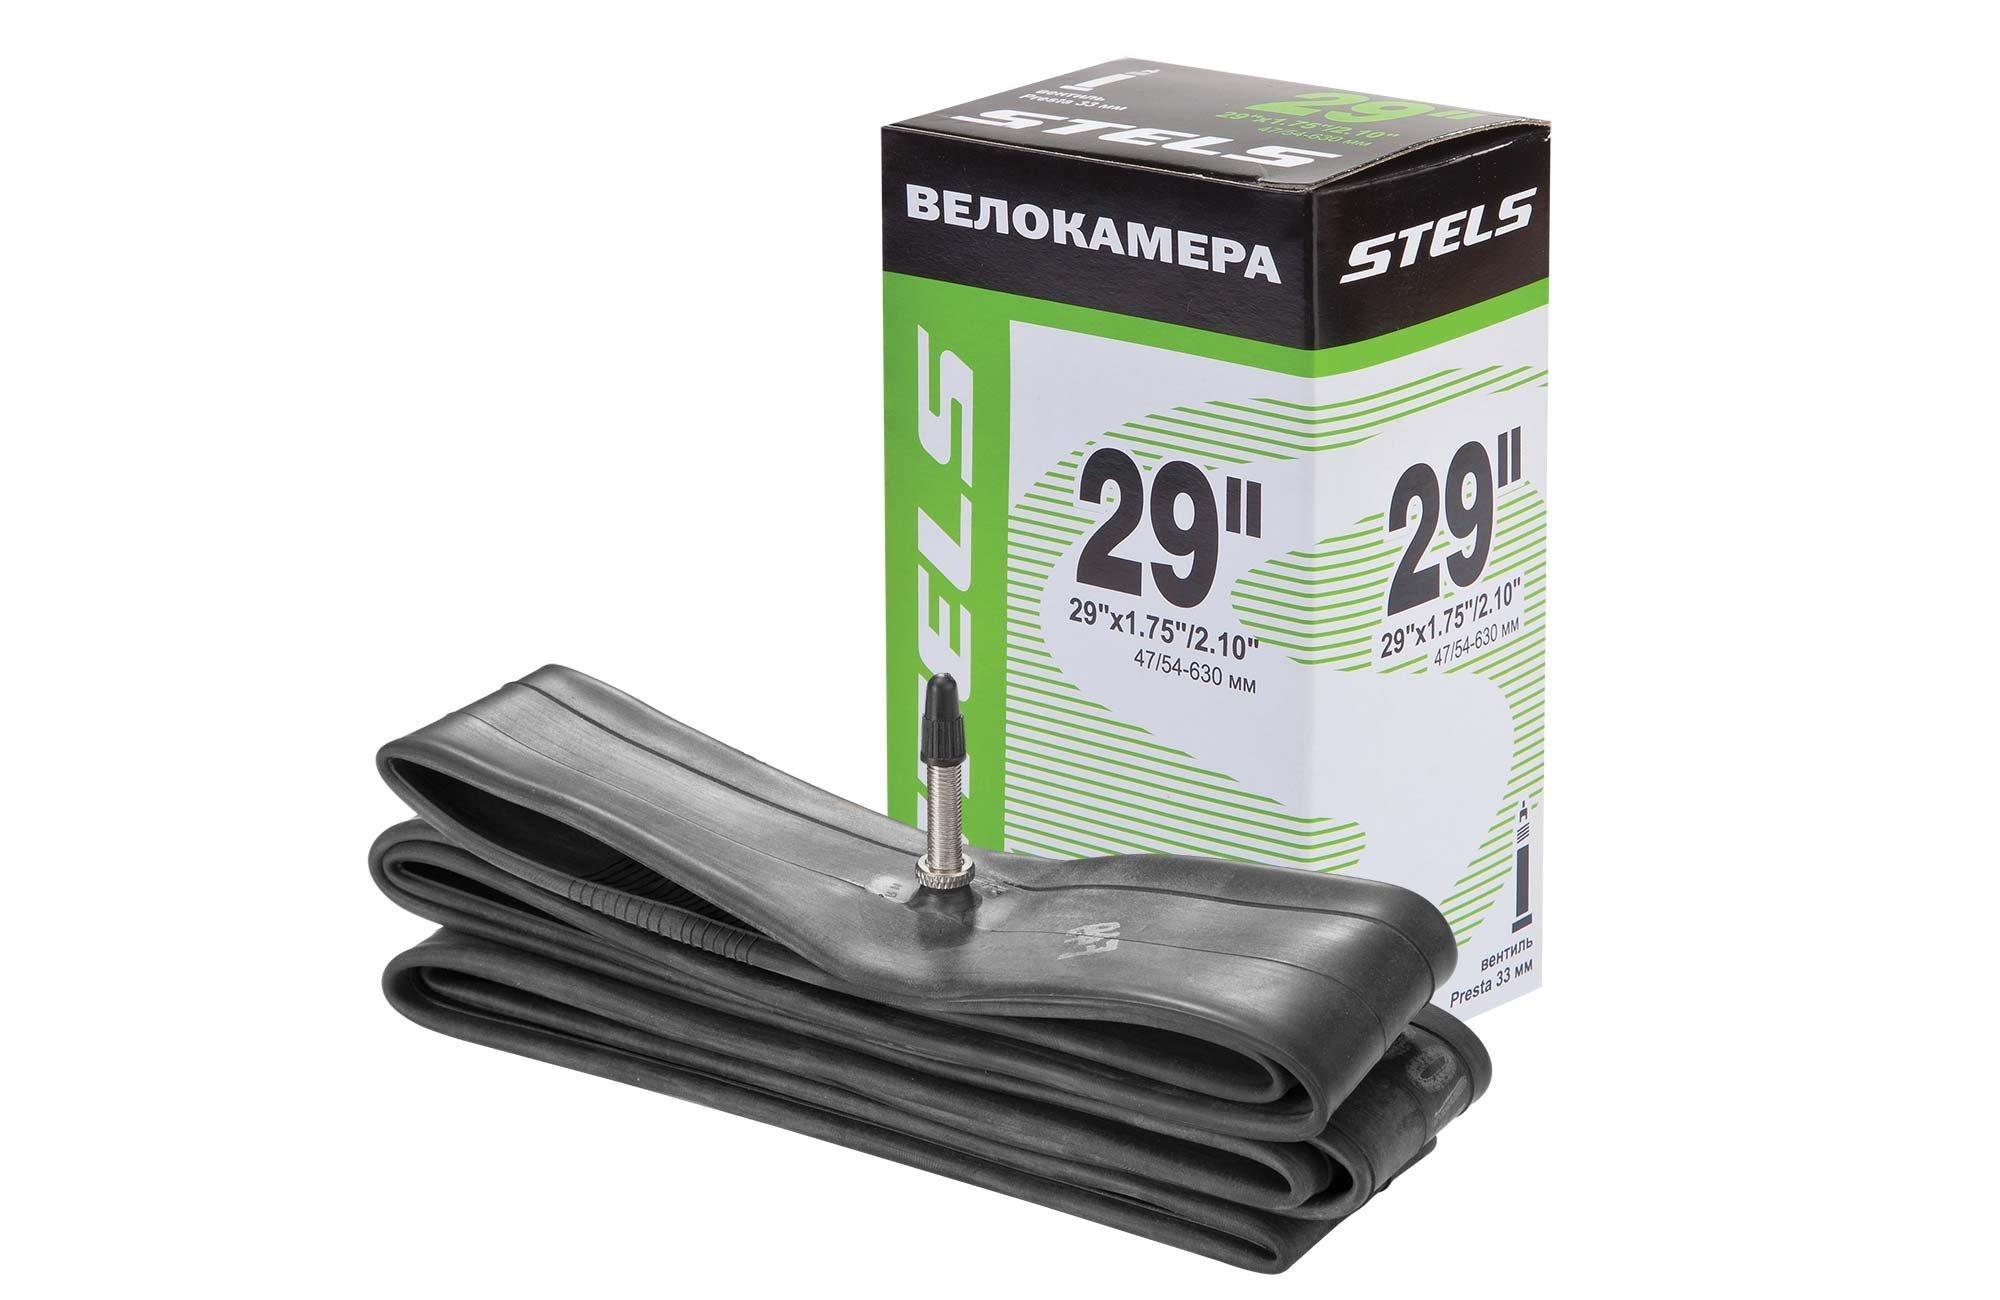 Камера Stels 29 x 1.75/2.10ʺ с велониппелем